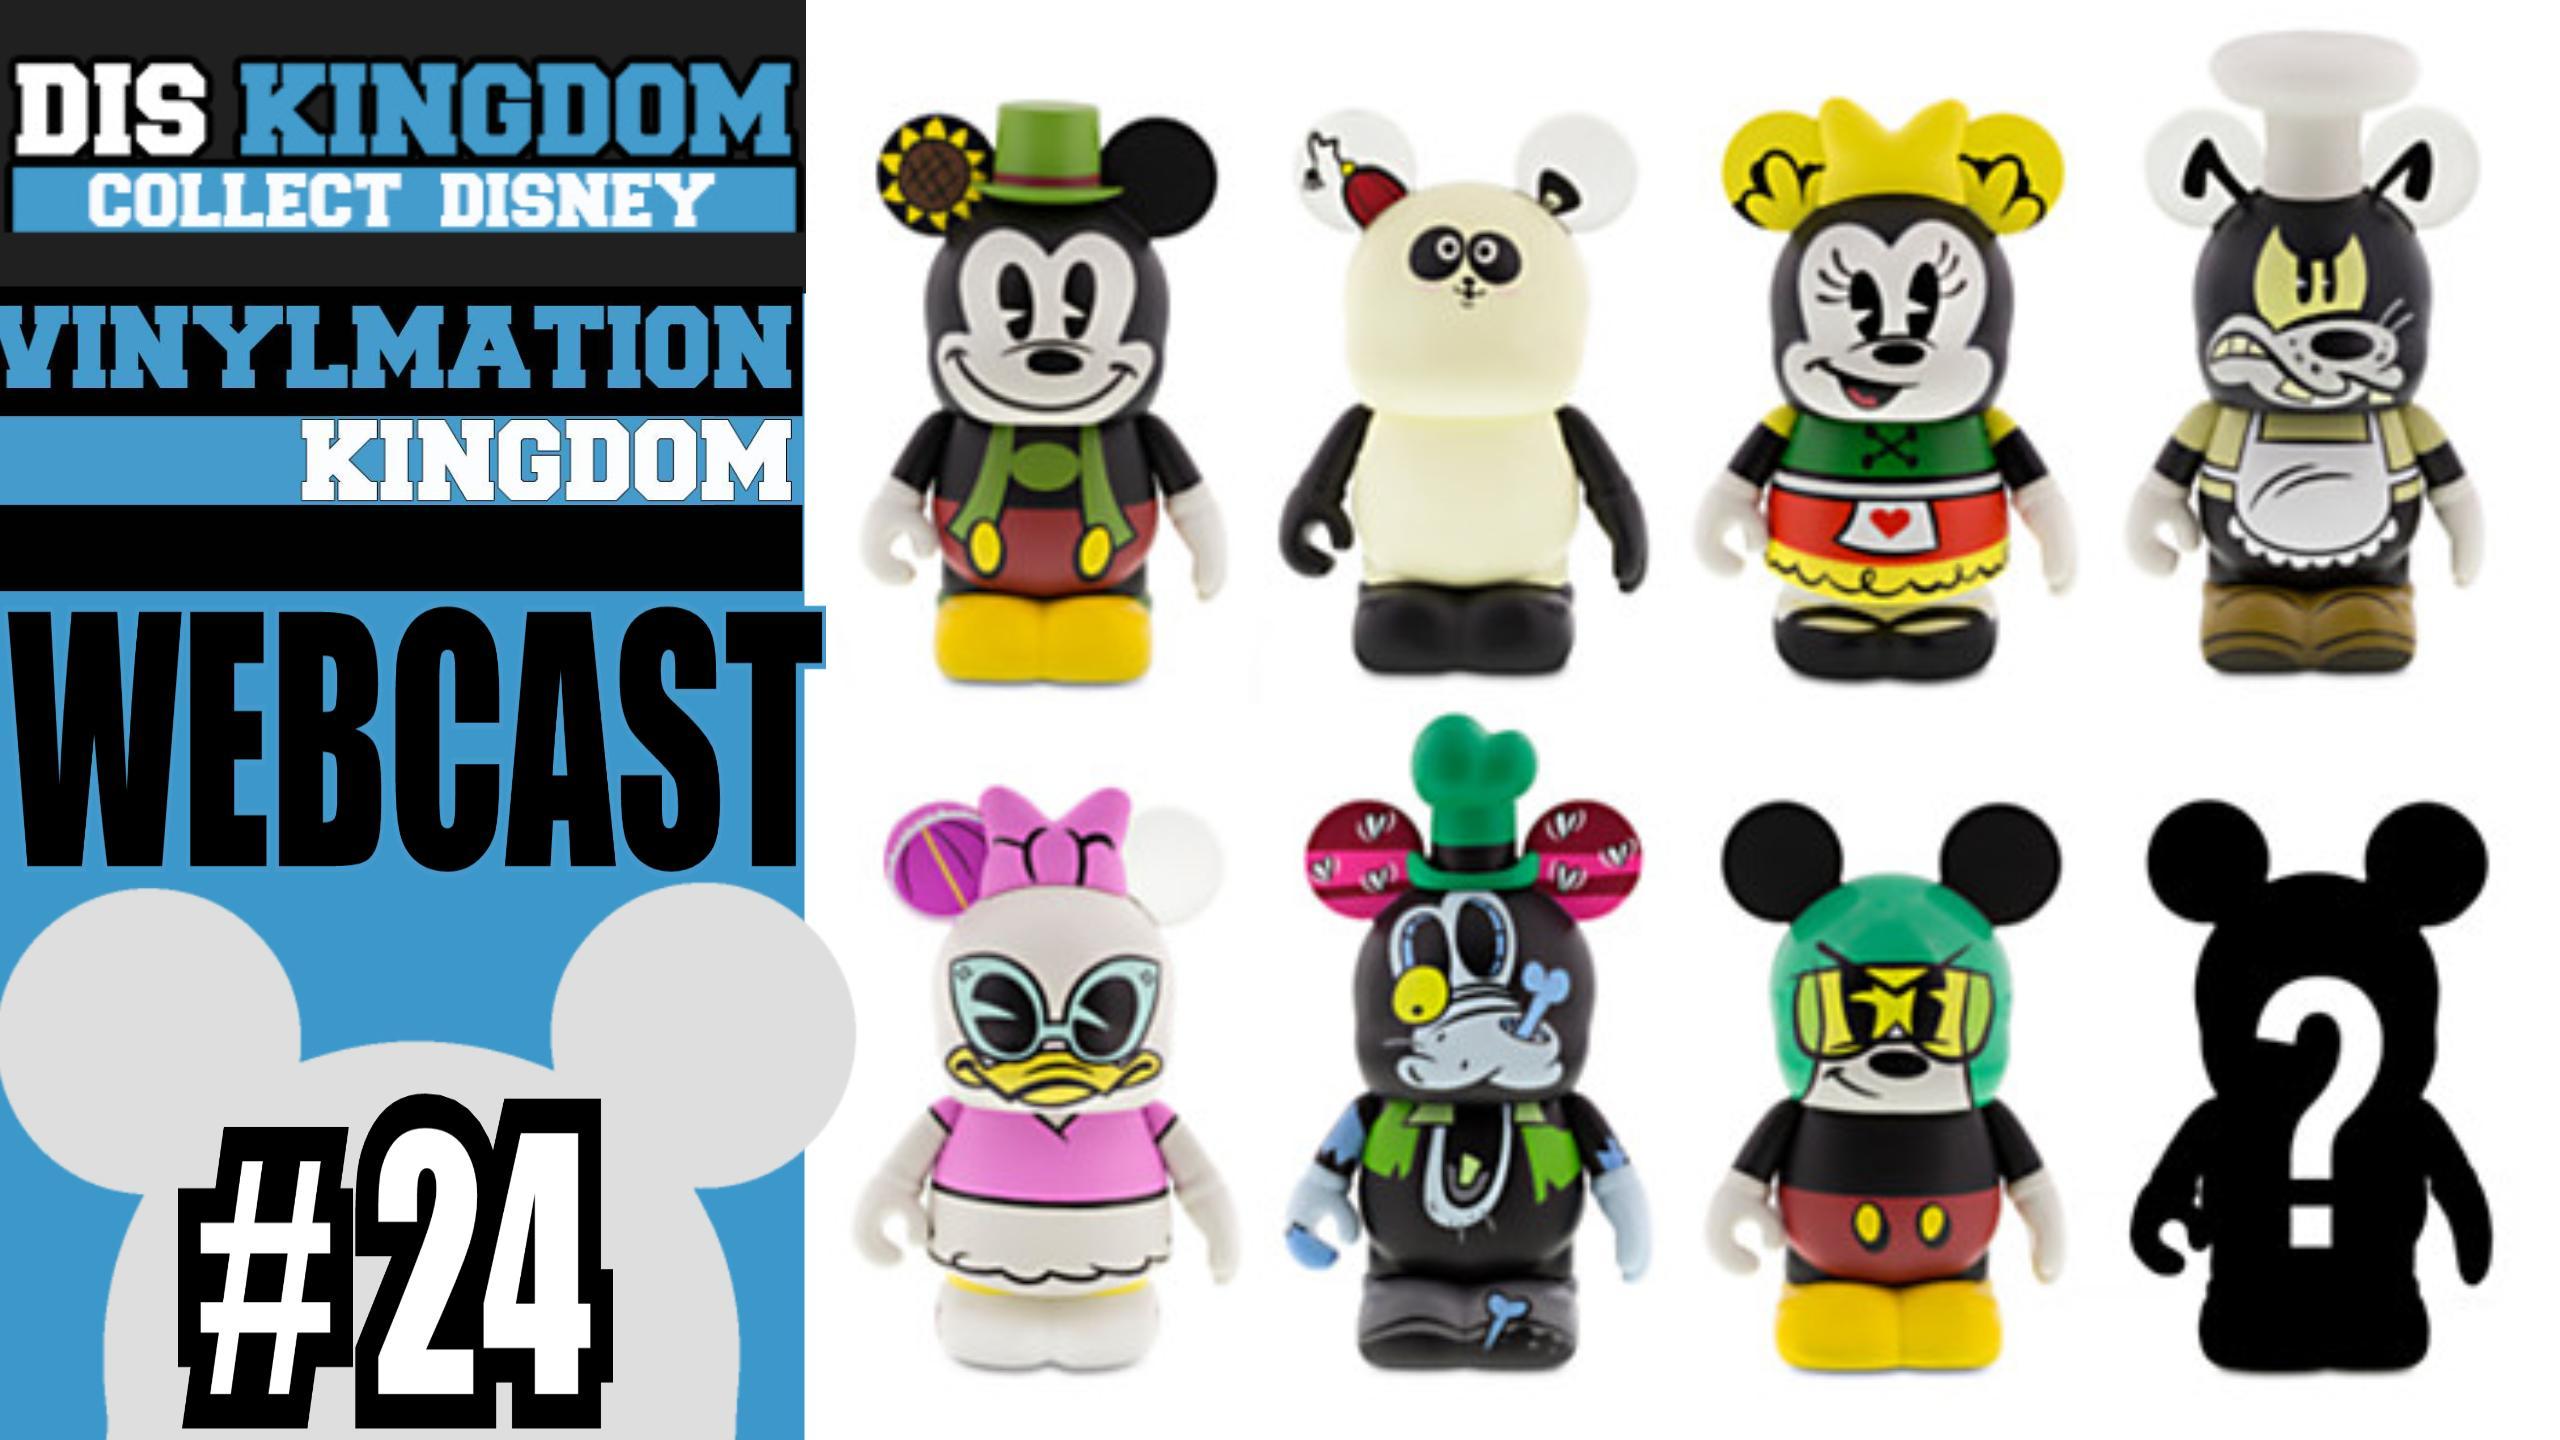 Vinylmation Kingdom 24 Frozen Amp Mickey Mouse Cartoon